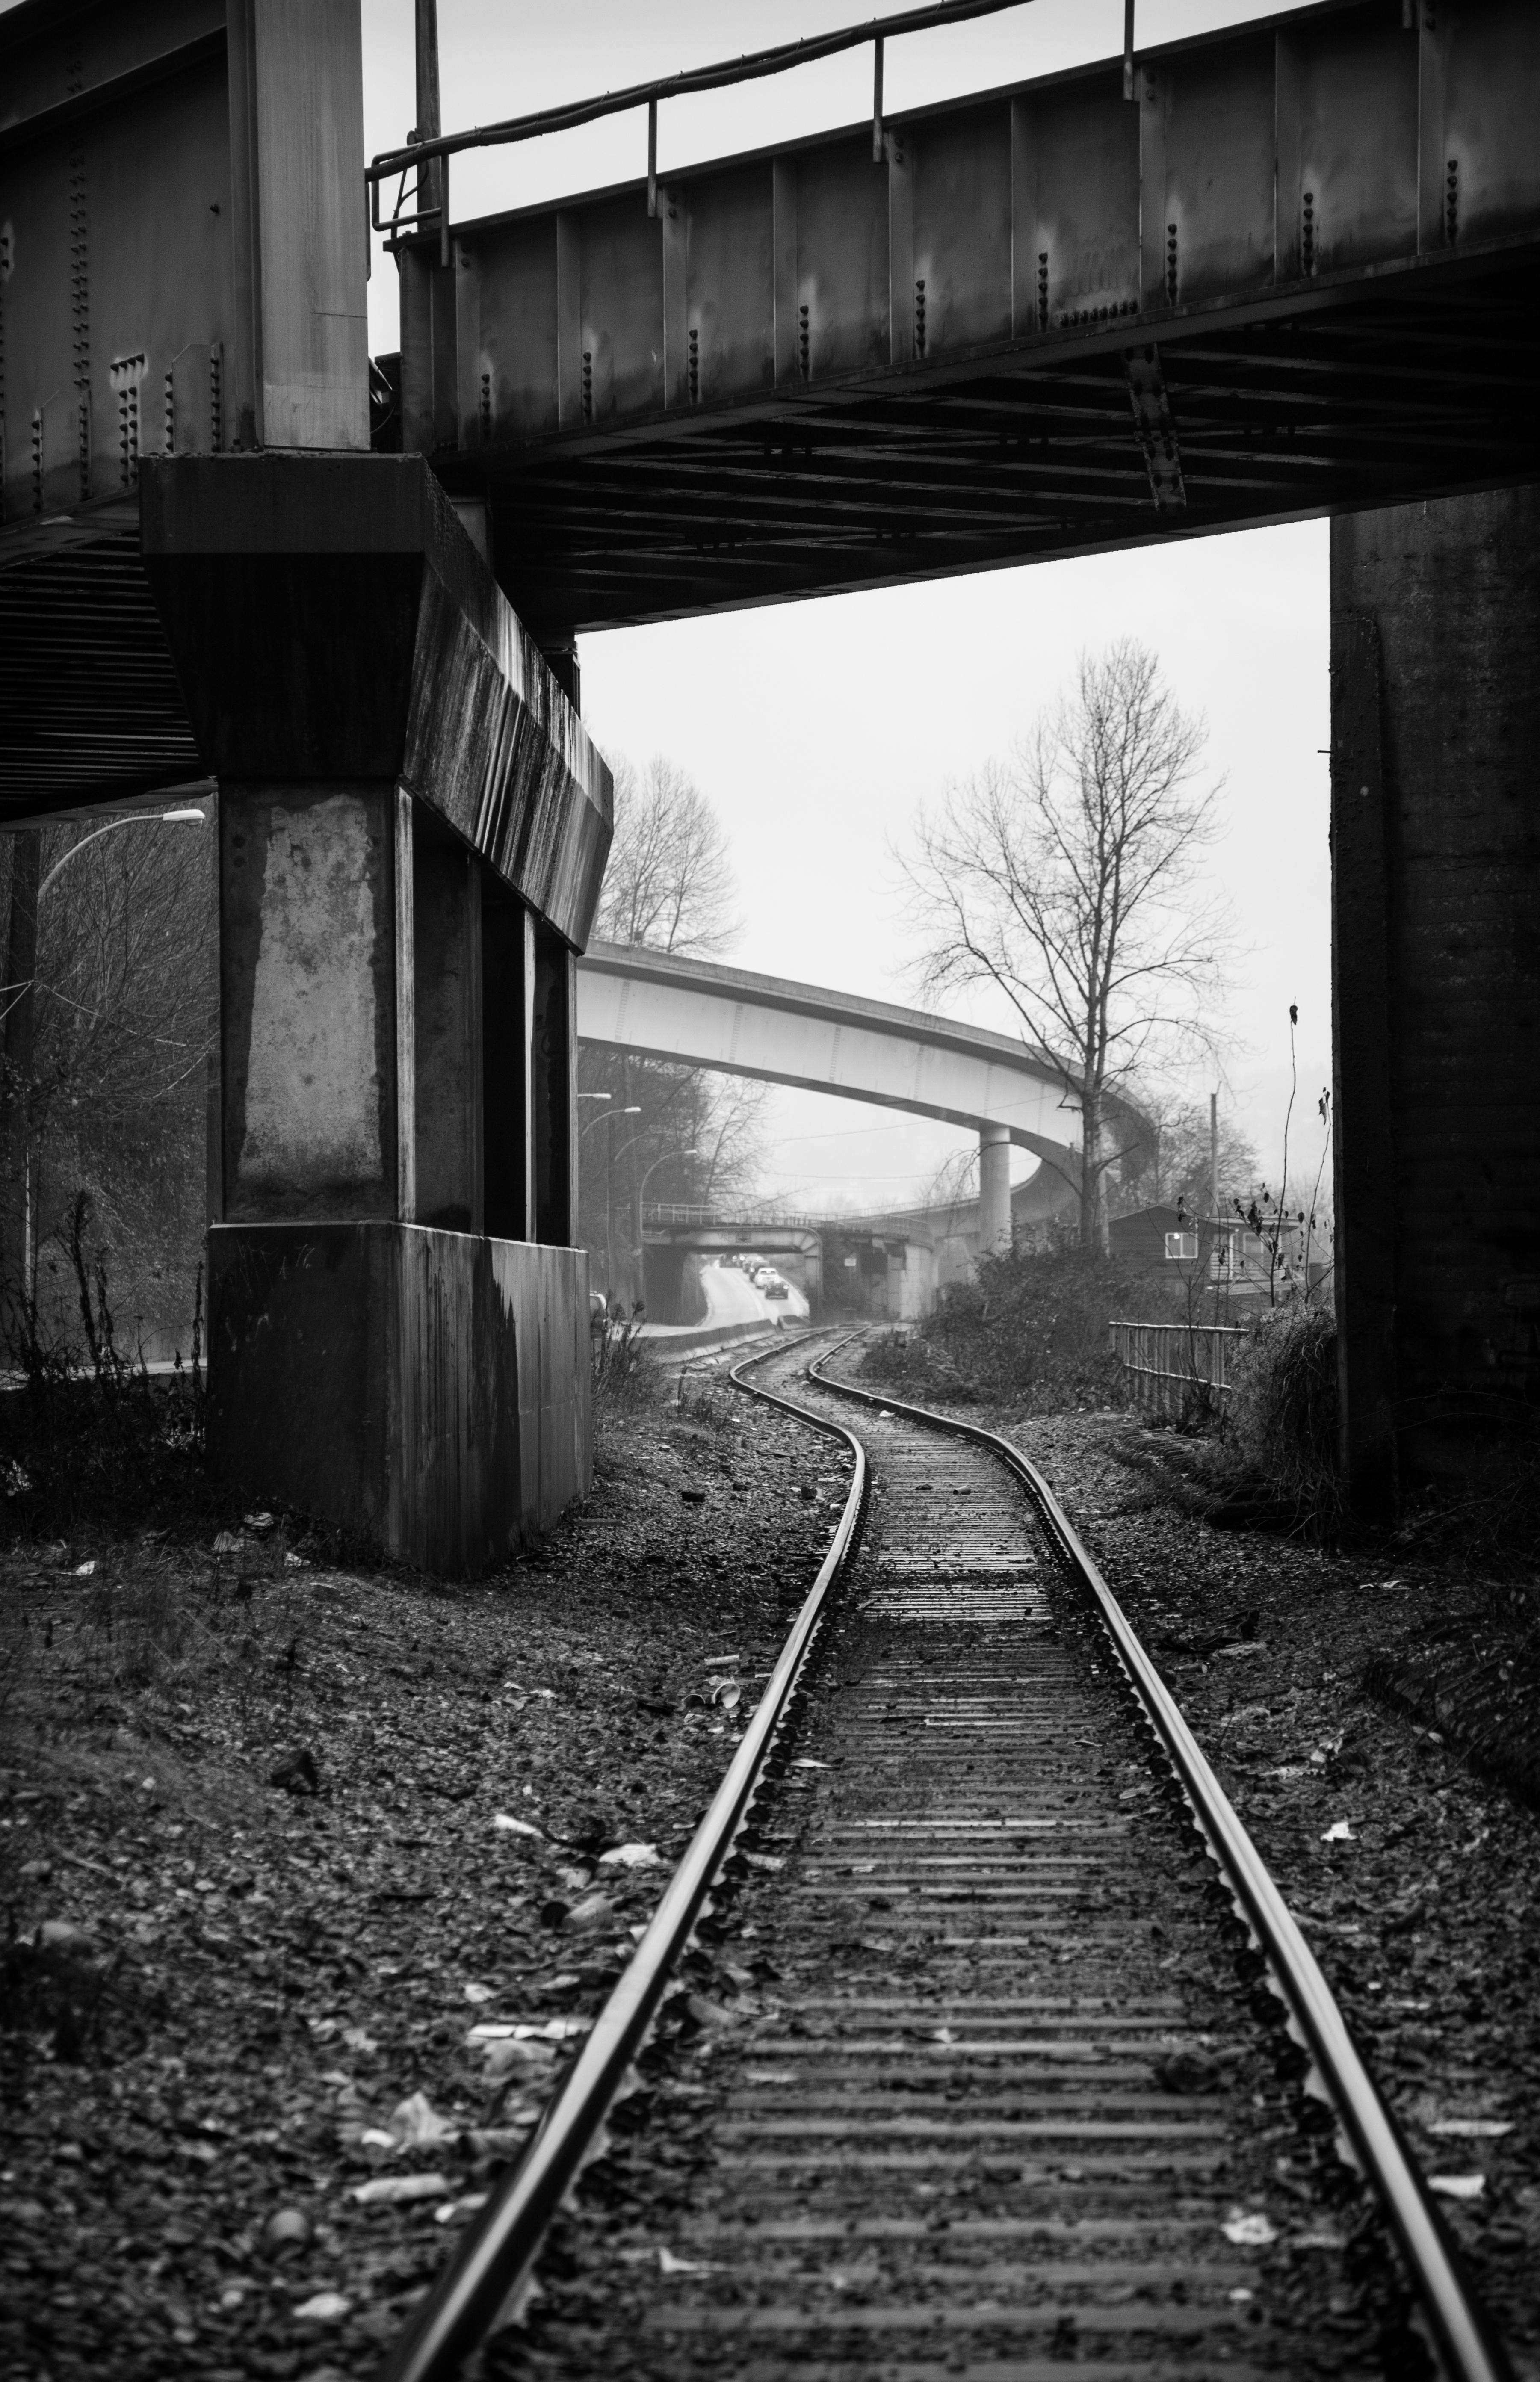 Tracks-34.jpg